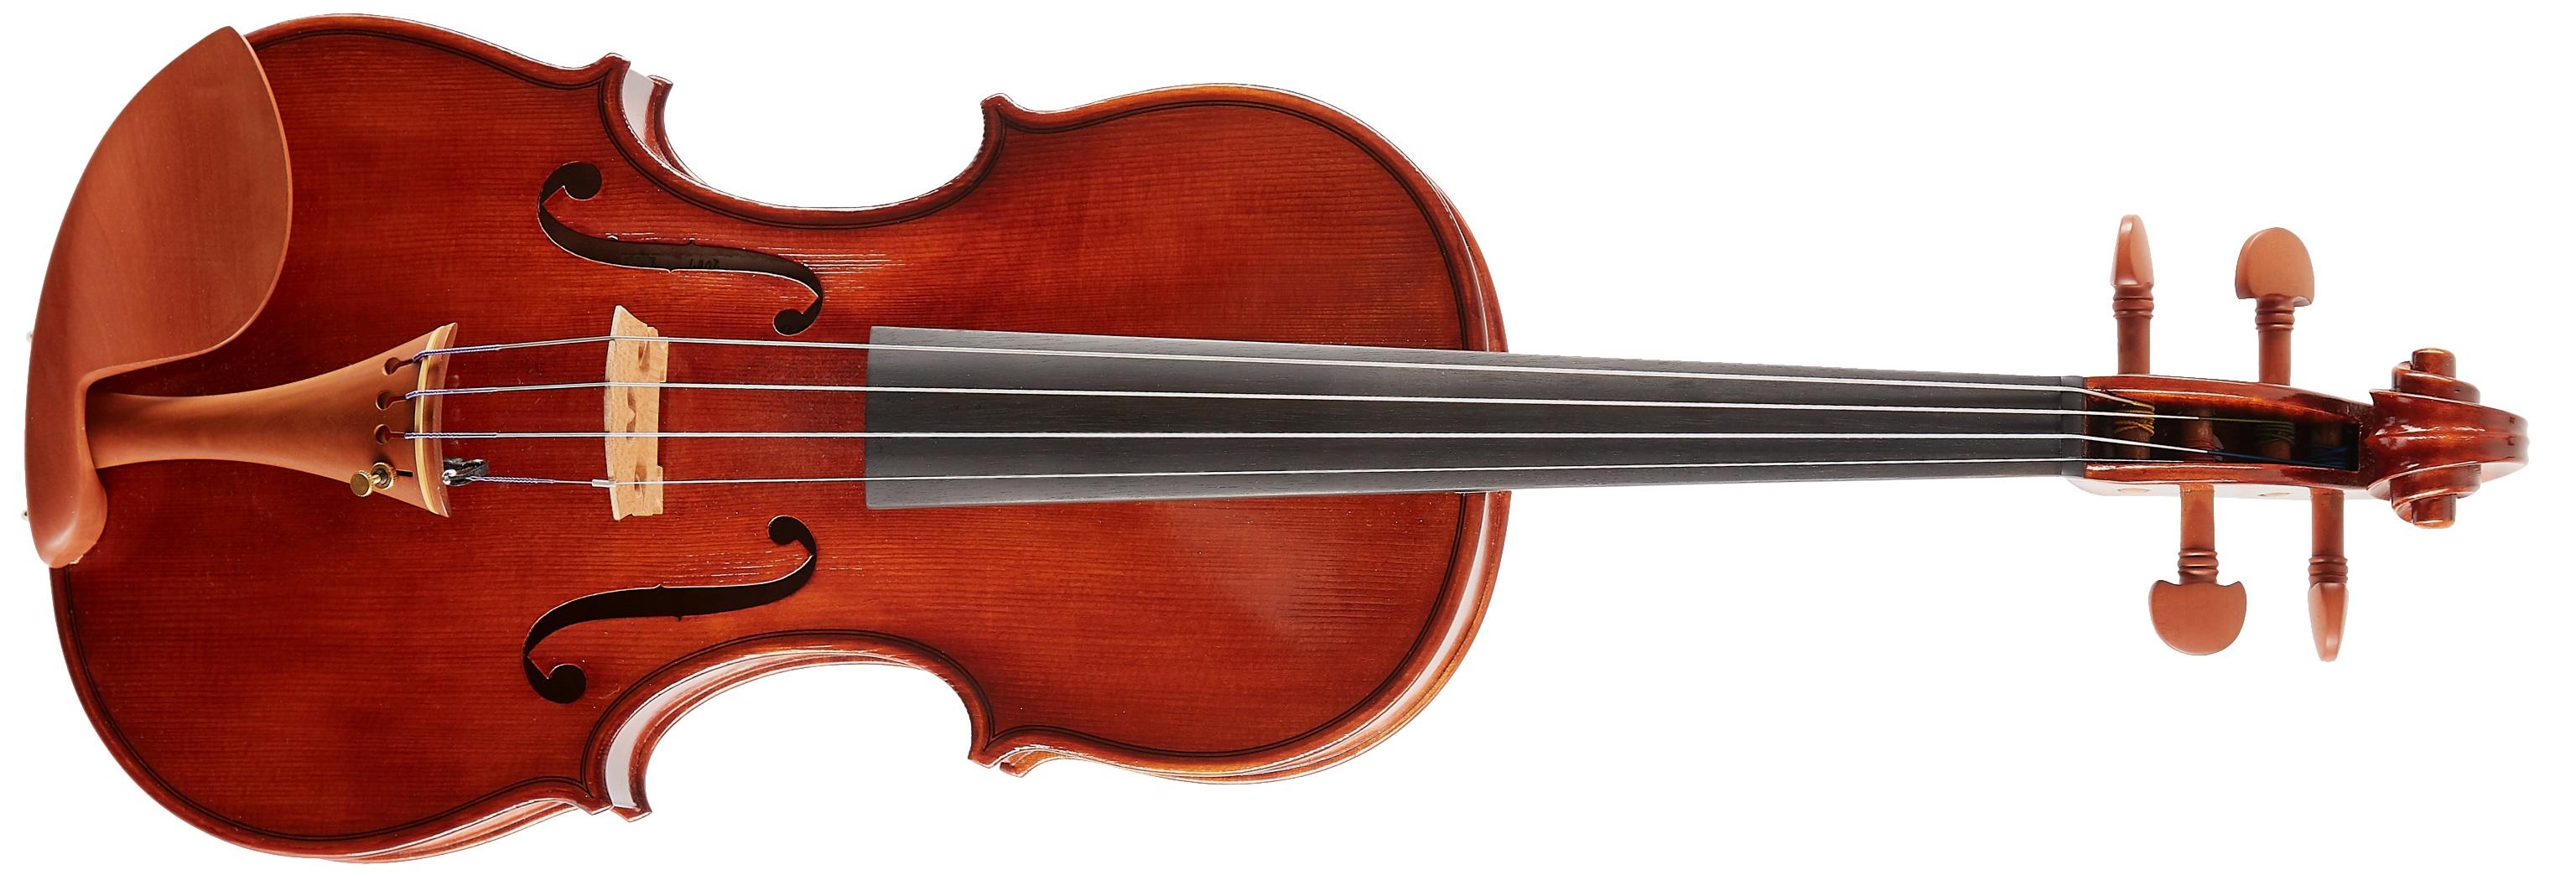 "Maestro Instrument Petr Rácz Guarneri del Gesu ""Lo Stauffer"" anno 2019"